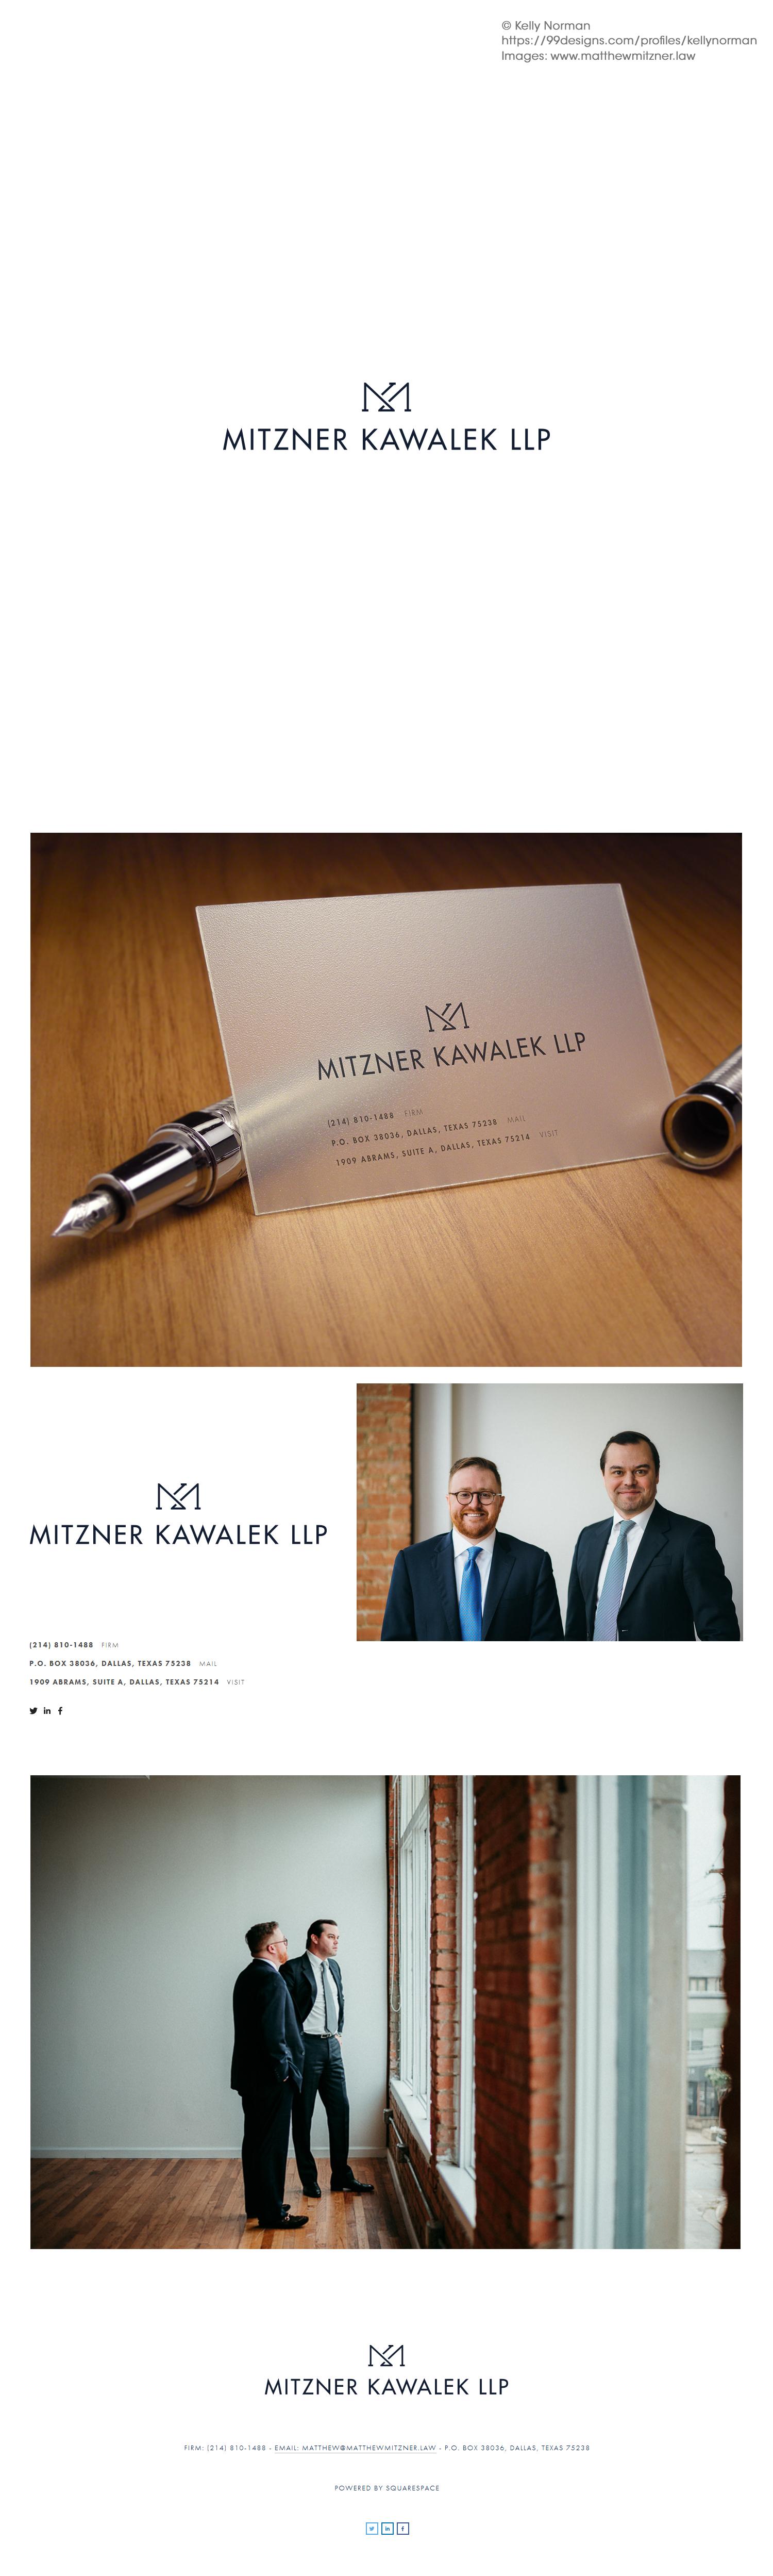 Mitzner Kawalek LLP